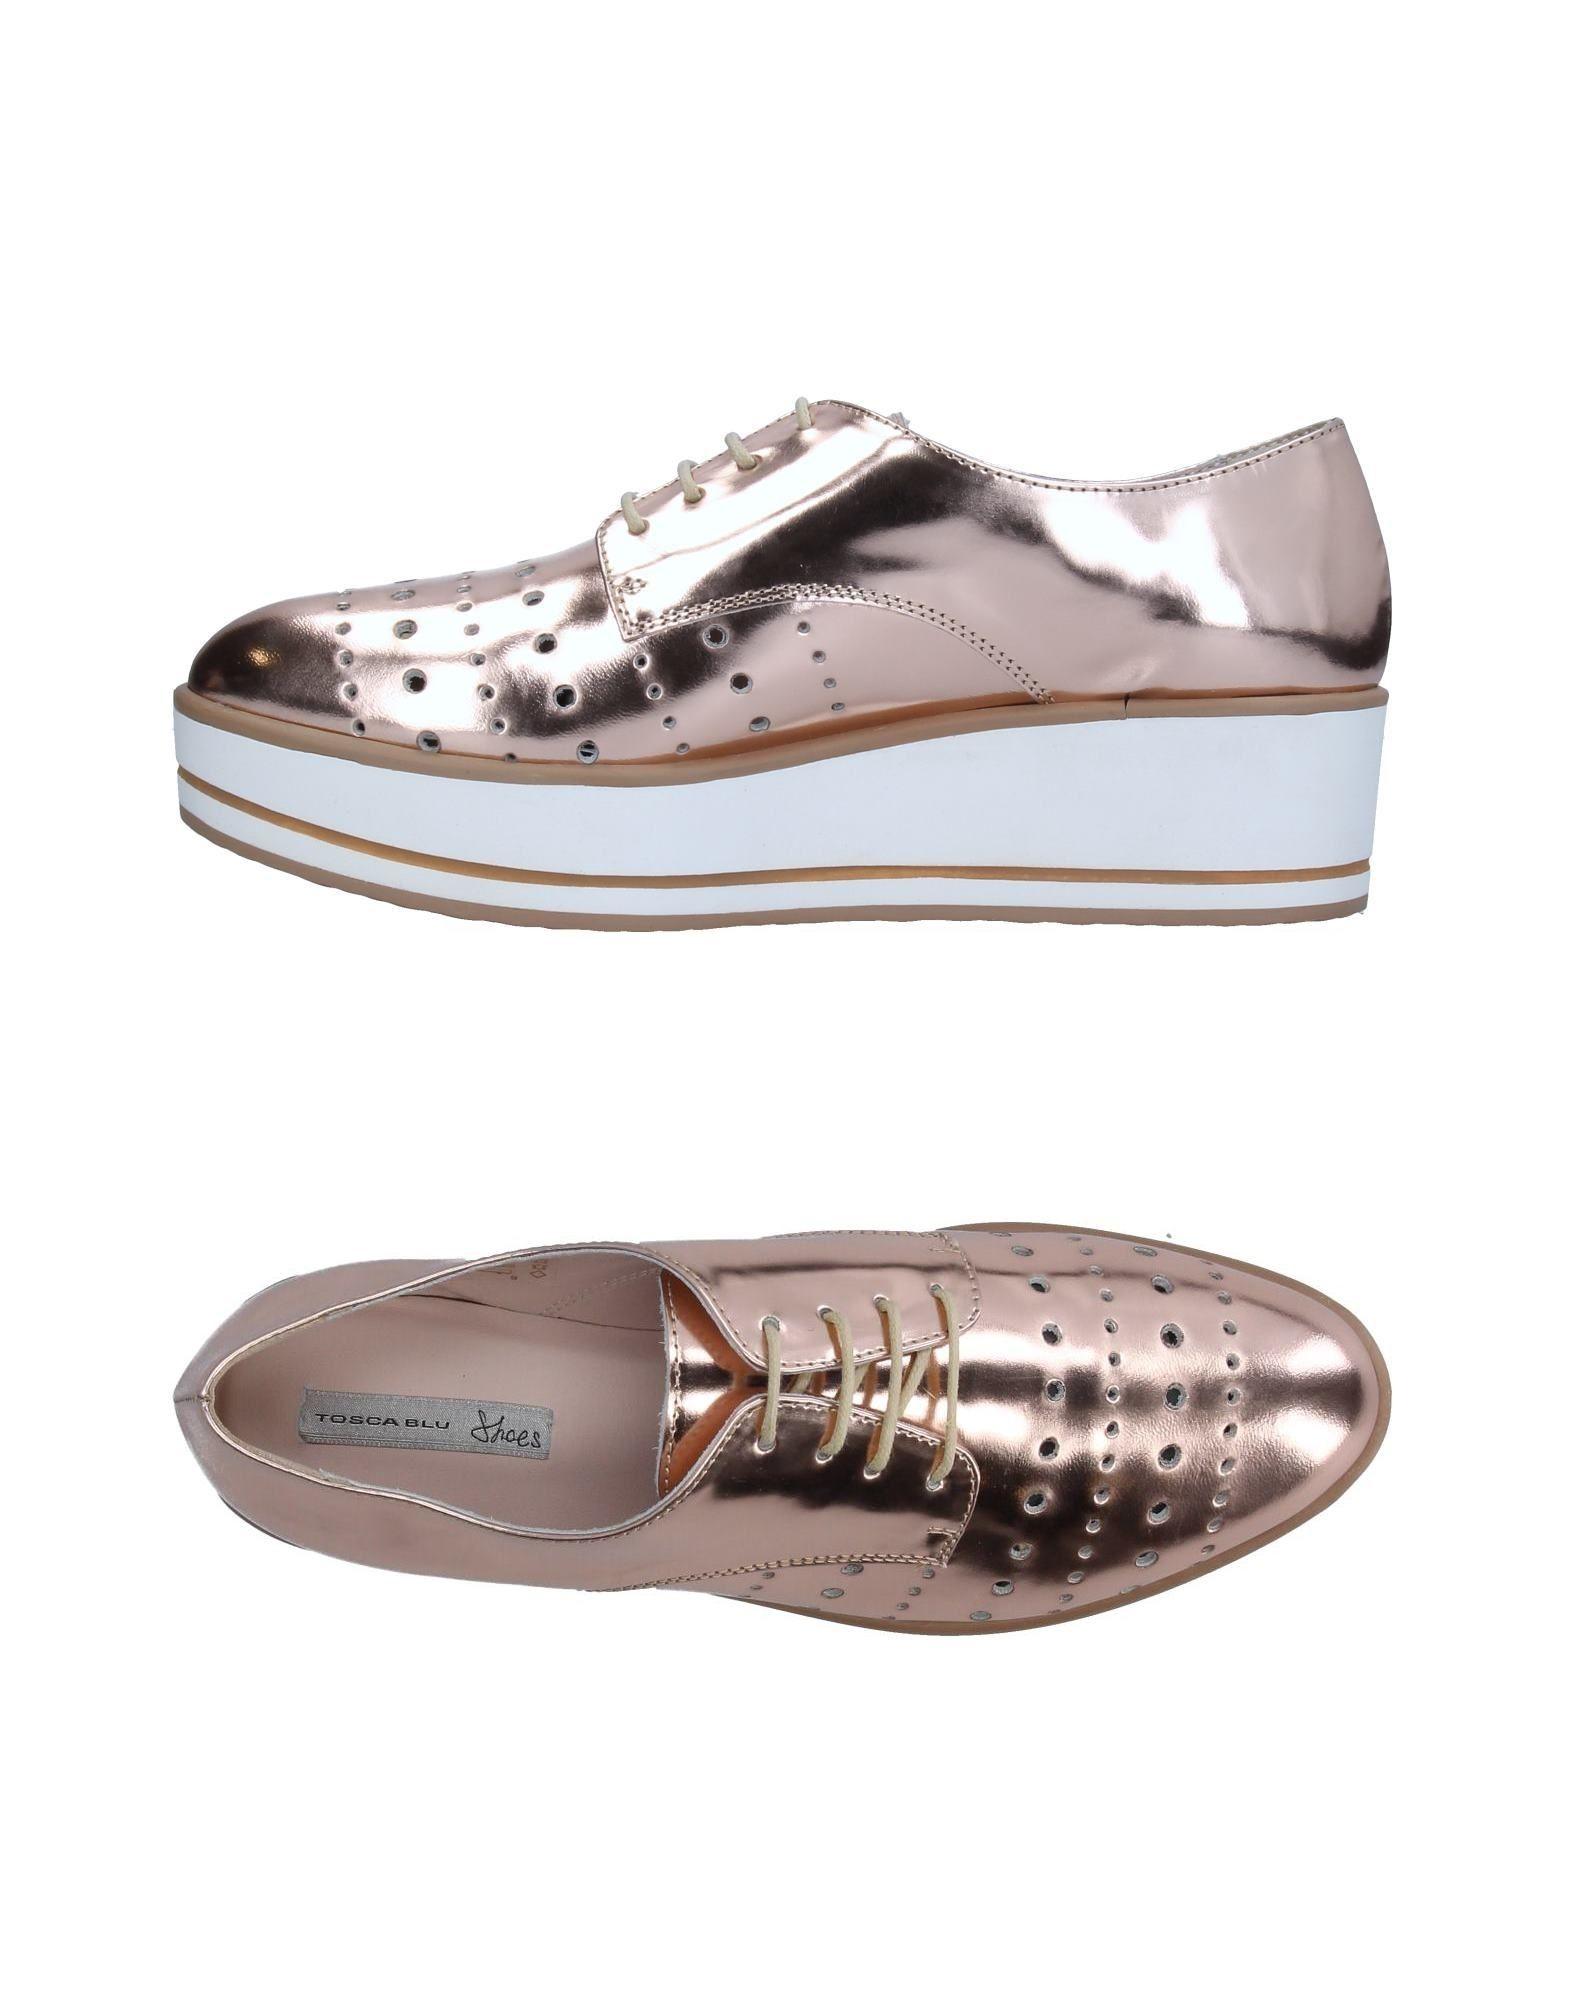 Tosca Blu Shoes Sneakers Damen  11326380UB Gute Qualität beliebte Schuhe